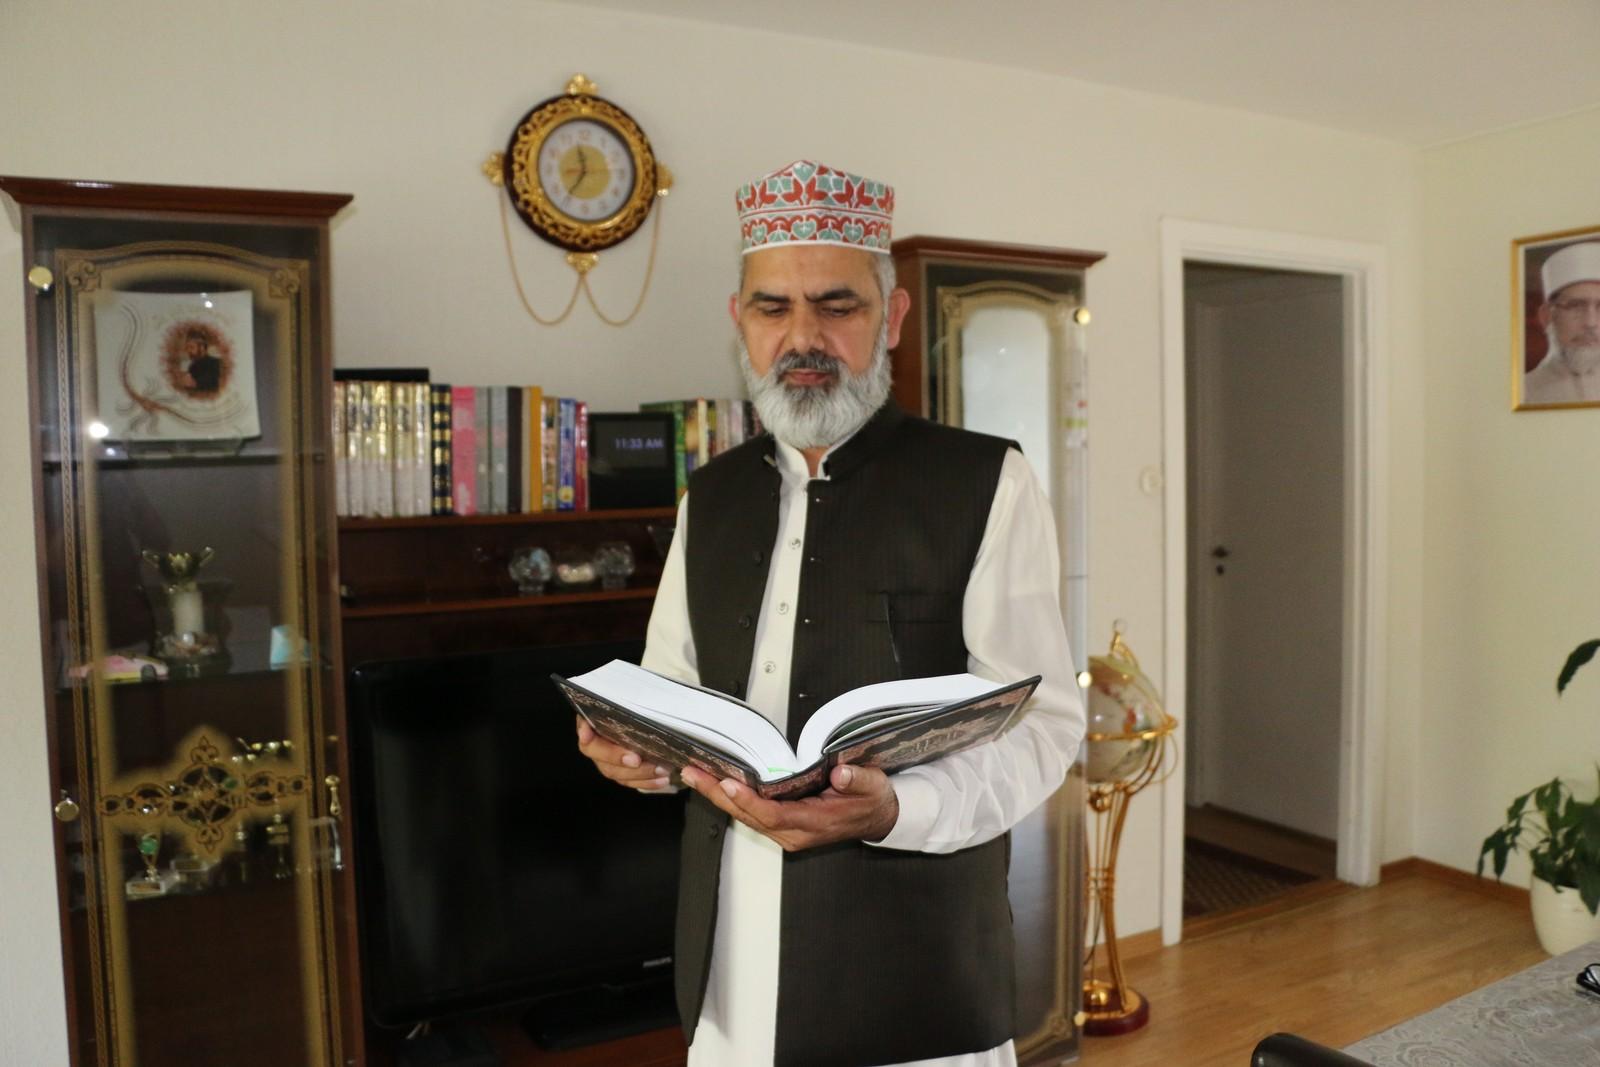 Imam Noor Ahmad Noor fra moskeen på Fjell i Drammen forbereder bønner til ramadan.